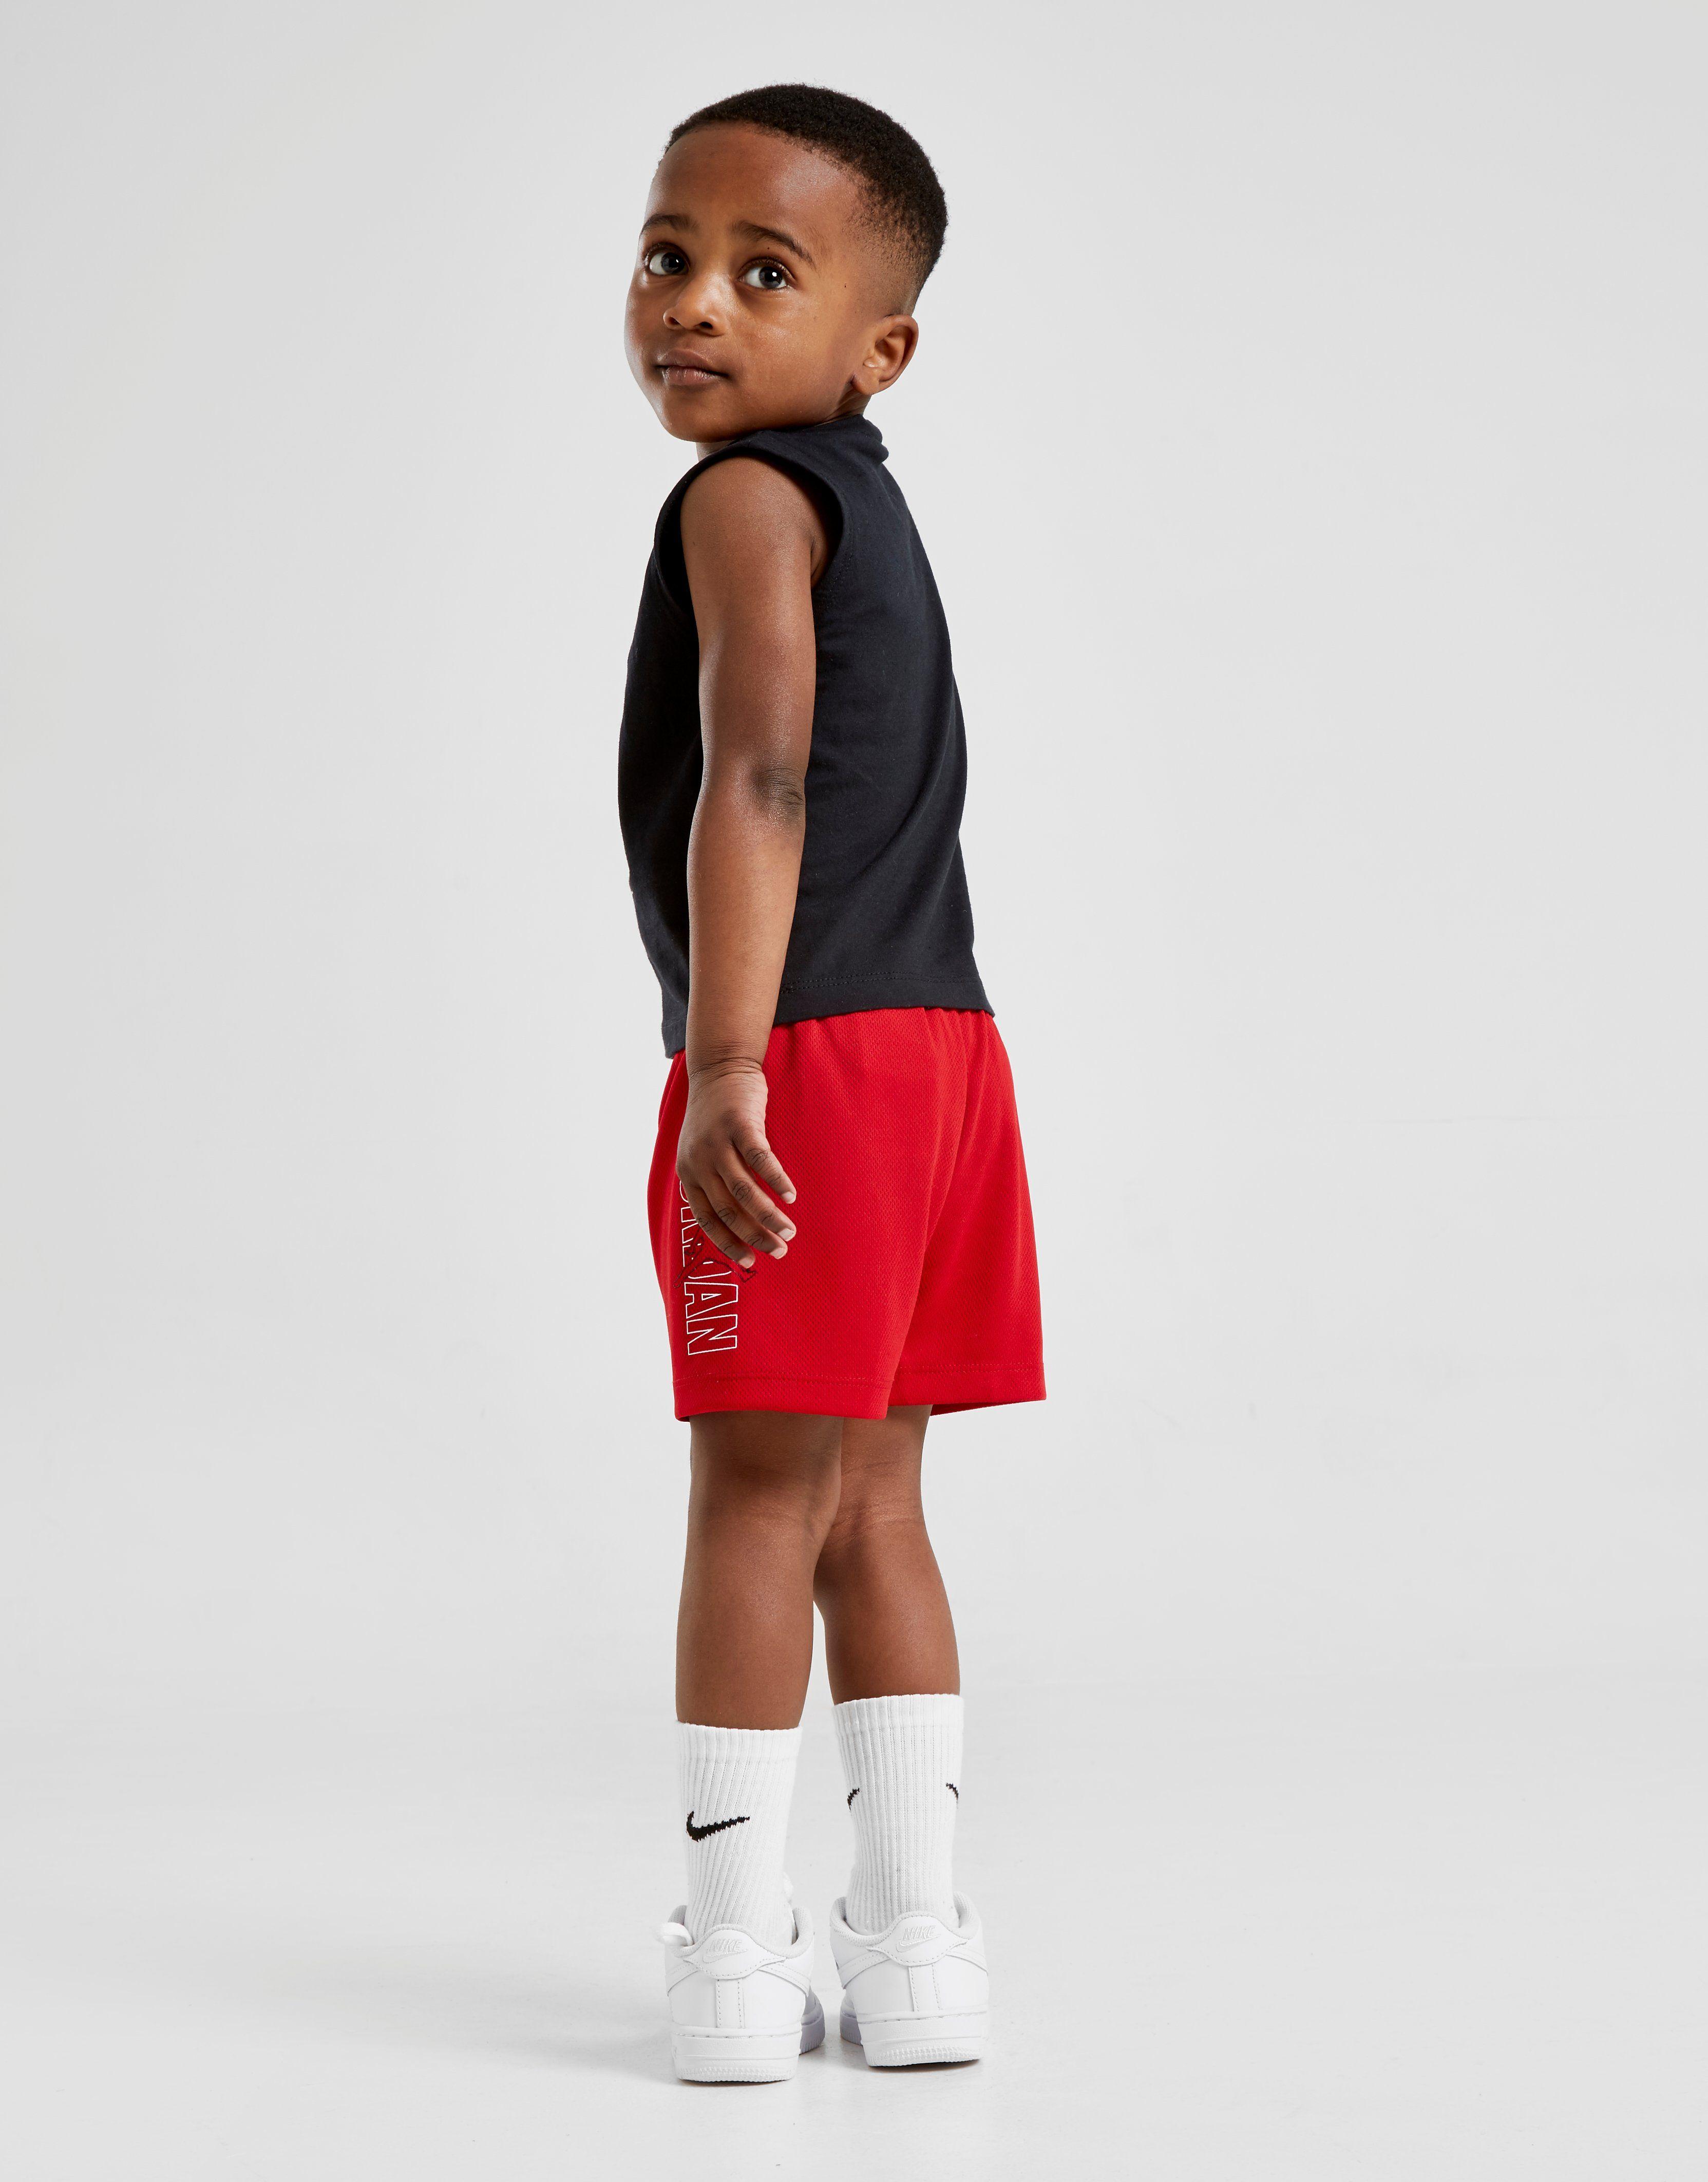 Jordan Light Up Tank Top/Short Set Infant